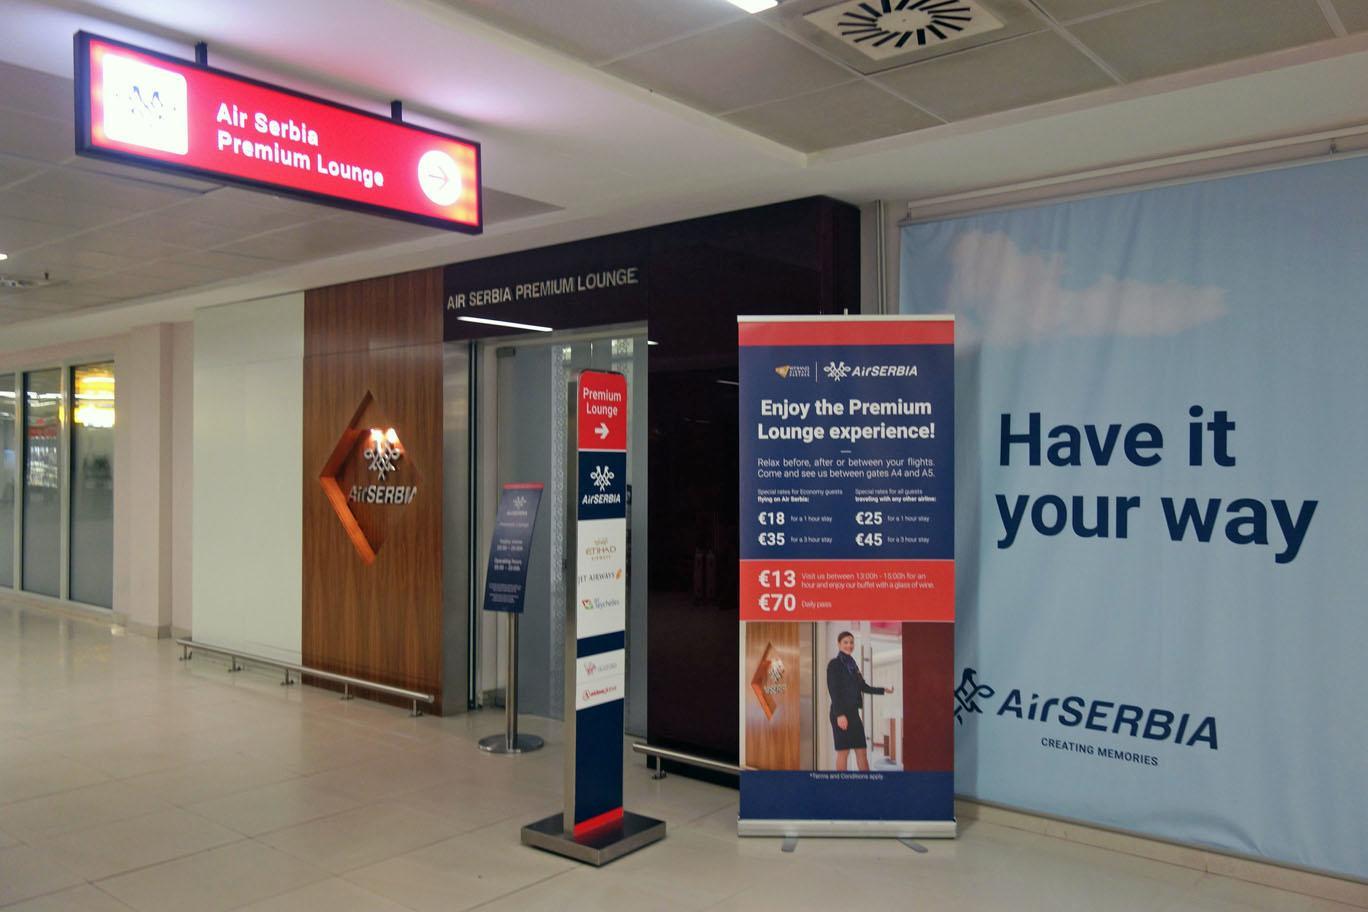 Обзор: Air Serbia Premium Lounge, Белград